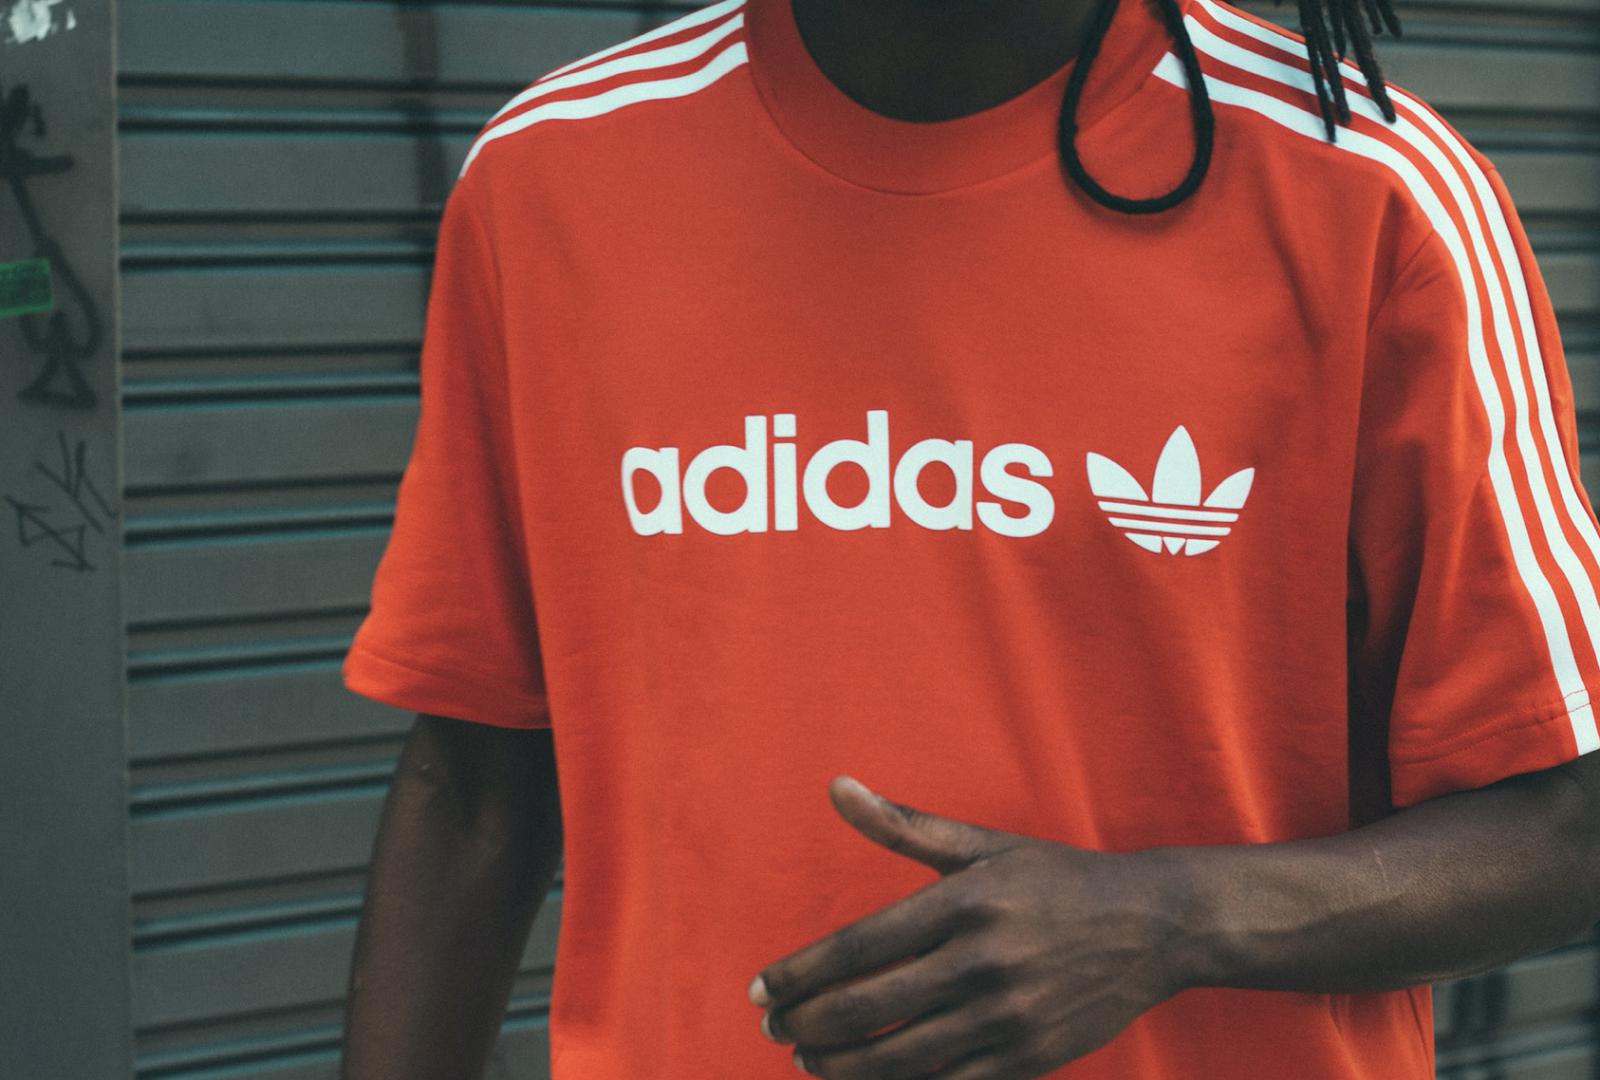 Adidas Runs to E-commerce